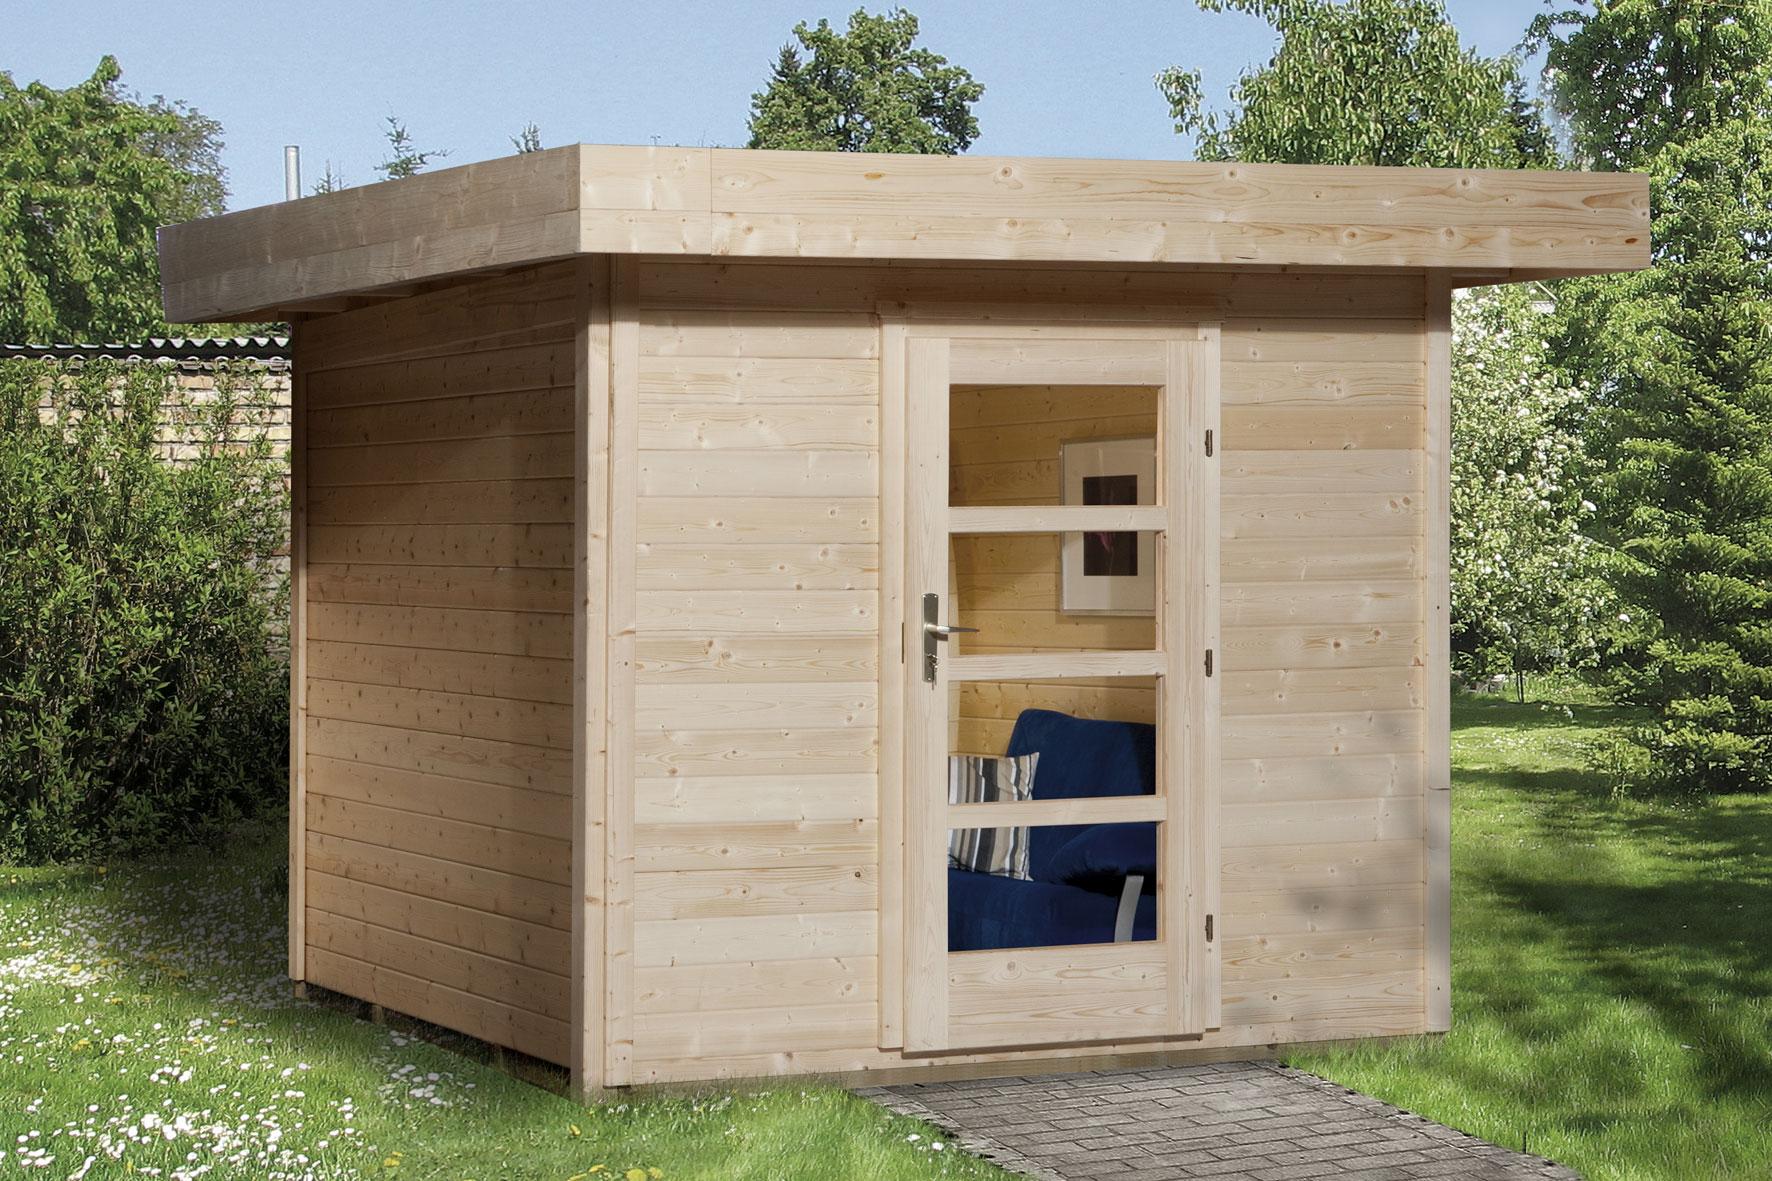 gartenhaus 28mm weka designhaus 172 gr 2 natur 280x378cm vd50cm bei. Black Bedroom Furniture Sets. Home Design Ideas